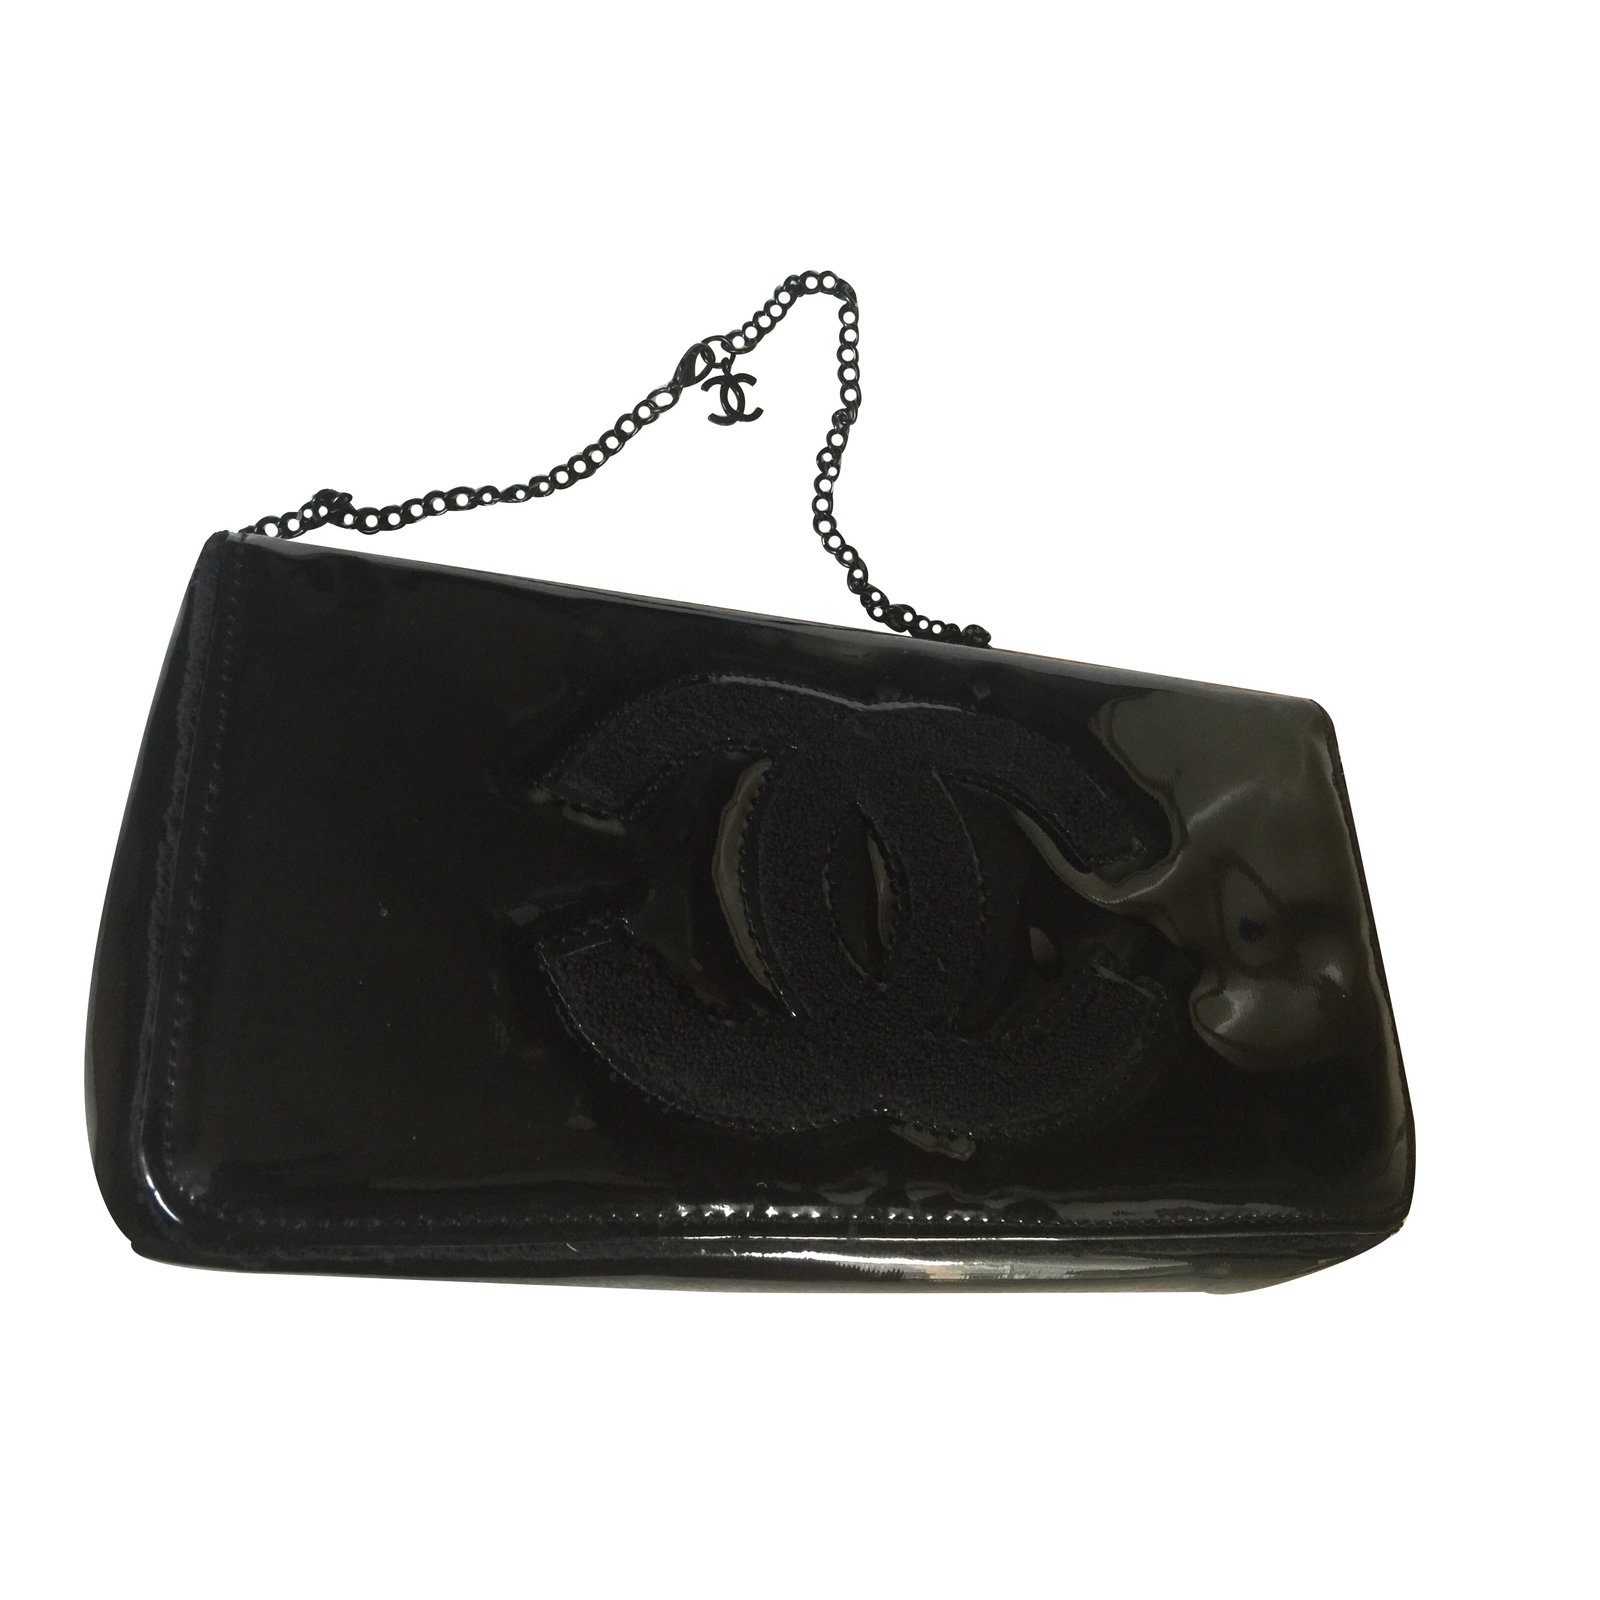 78fb1a766dd67 Chanel Clutch bag VIP gifts Other Black ref.24364 - Joli Closet